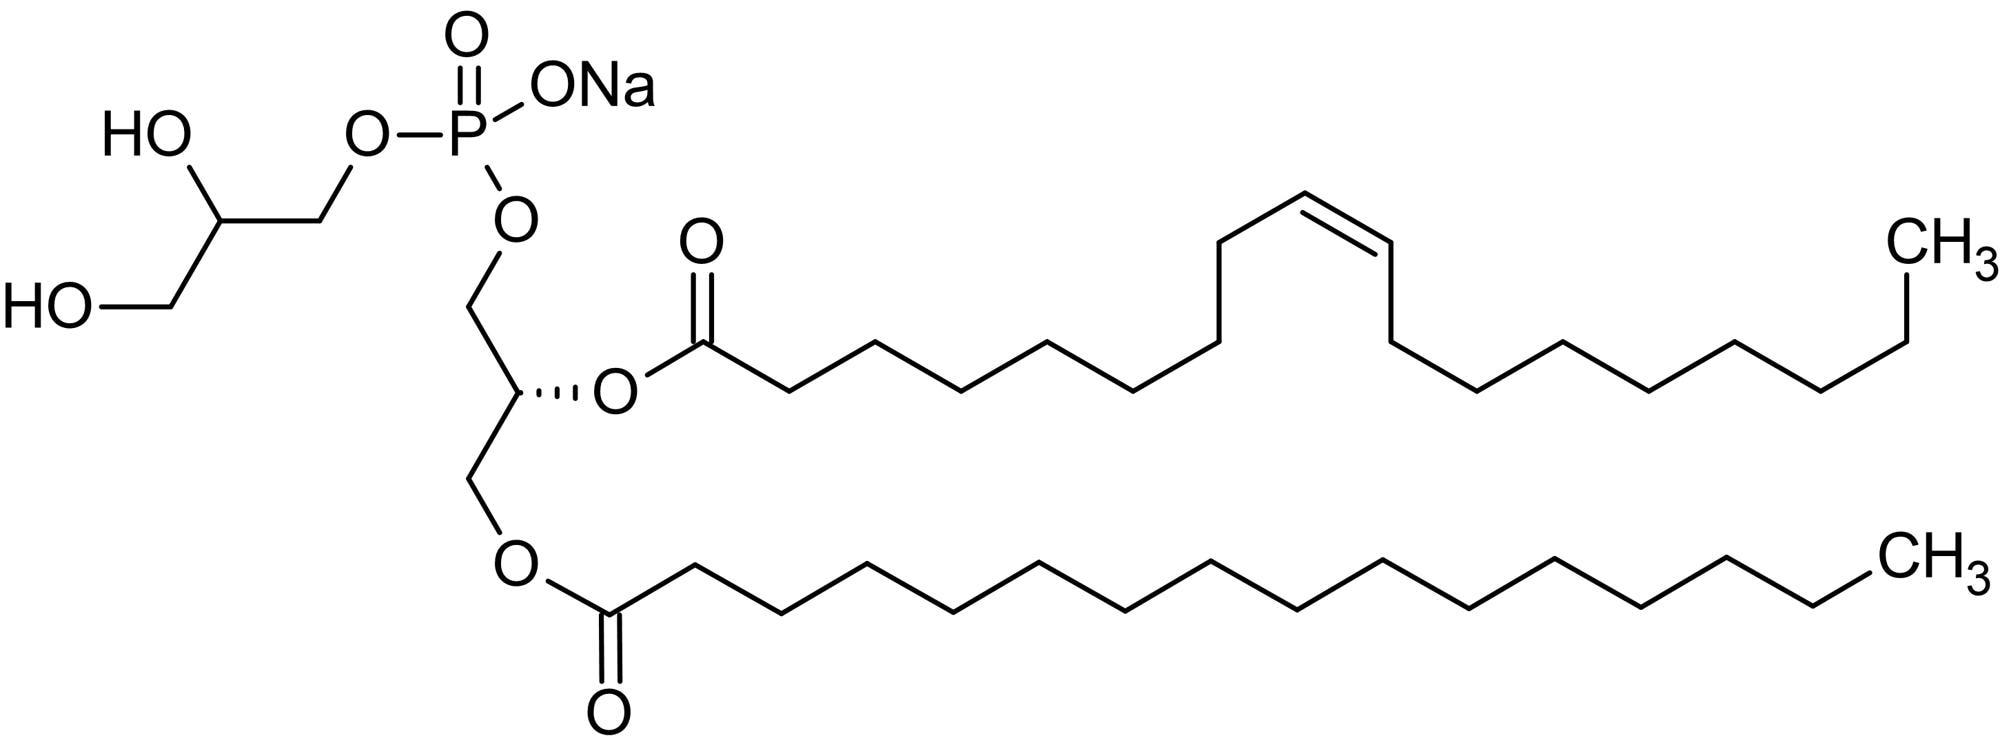 Chemical Structure - 1-Palmitoyl-2-oleoyl-sn-glycero-3-phosphorylglycerol sodium salt, Phosphatidylglycerol component (ab143959)